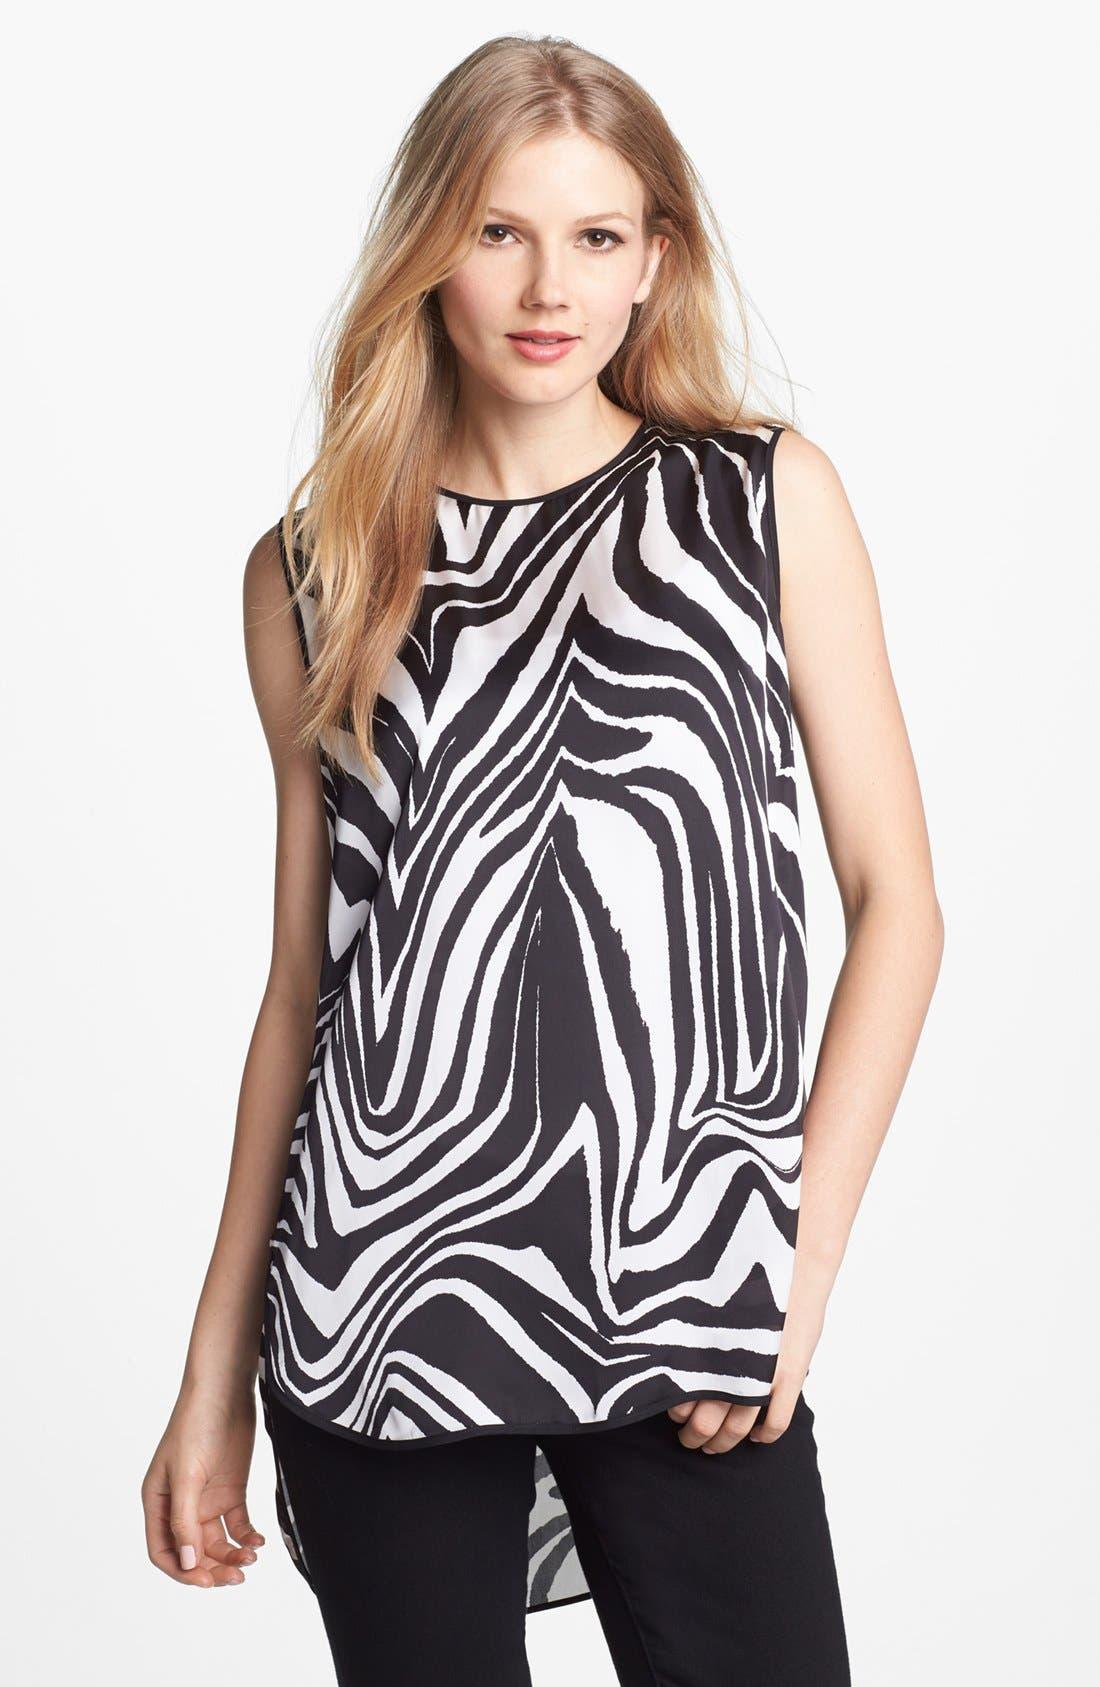 Main Image - Vince Camuto Zebra Print High/Low Sleeveless Blouse